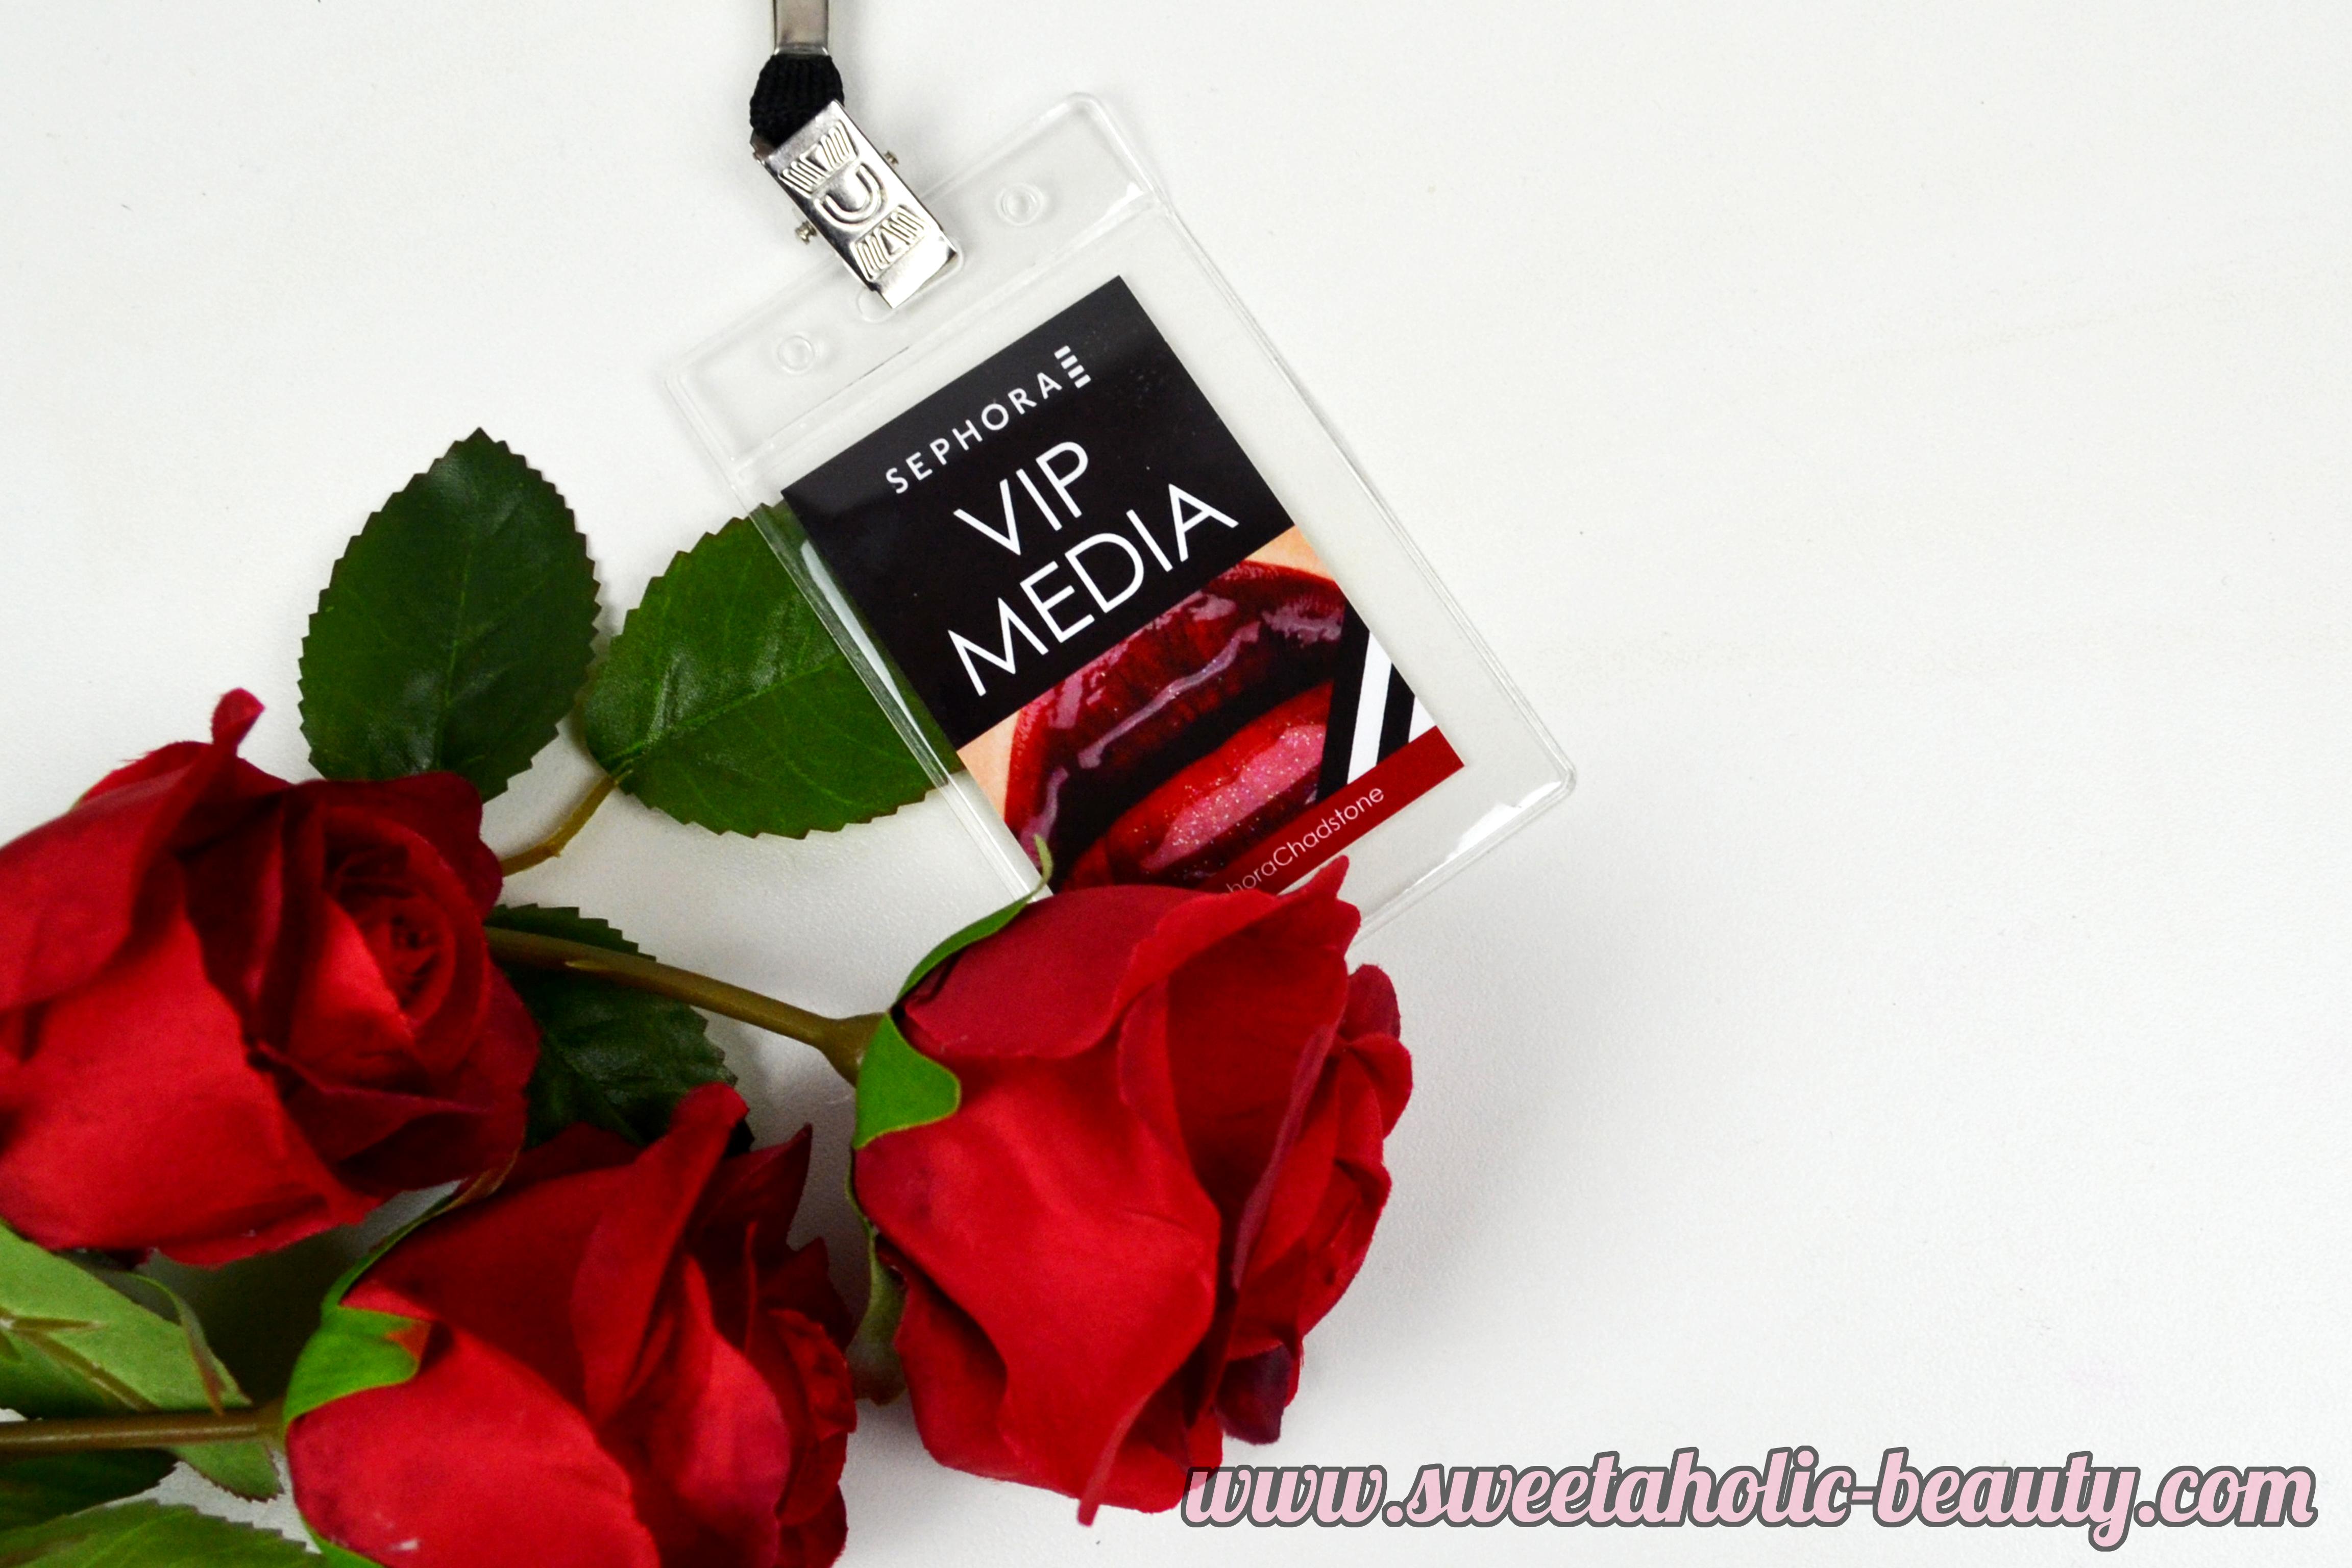 Sephora Chadstone Store Opening Haul - Sweetaholic Beauty